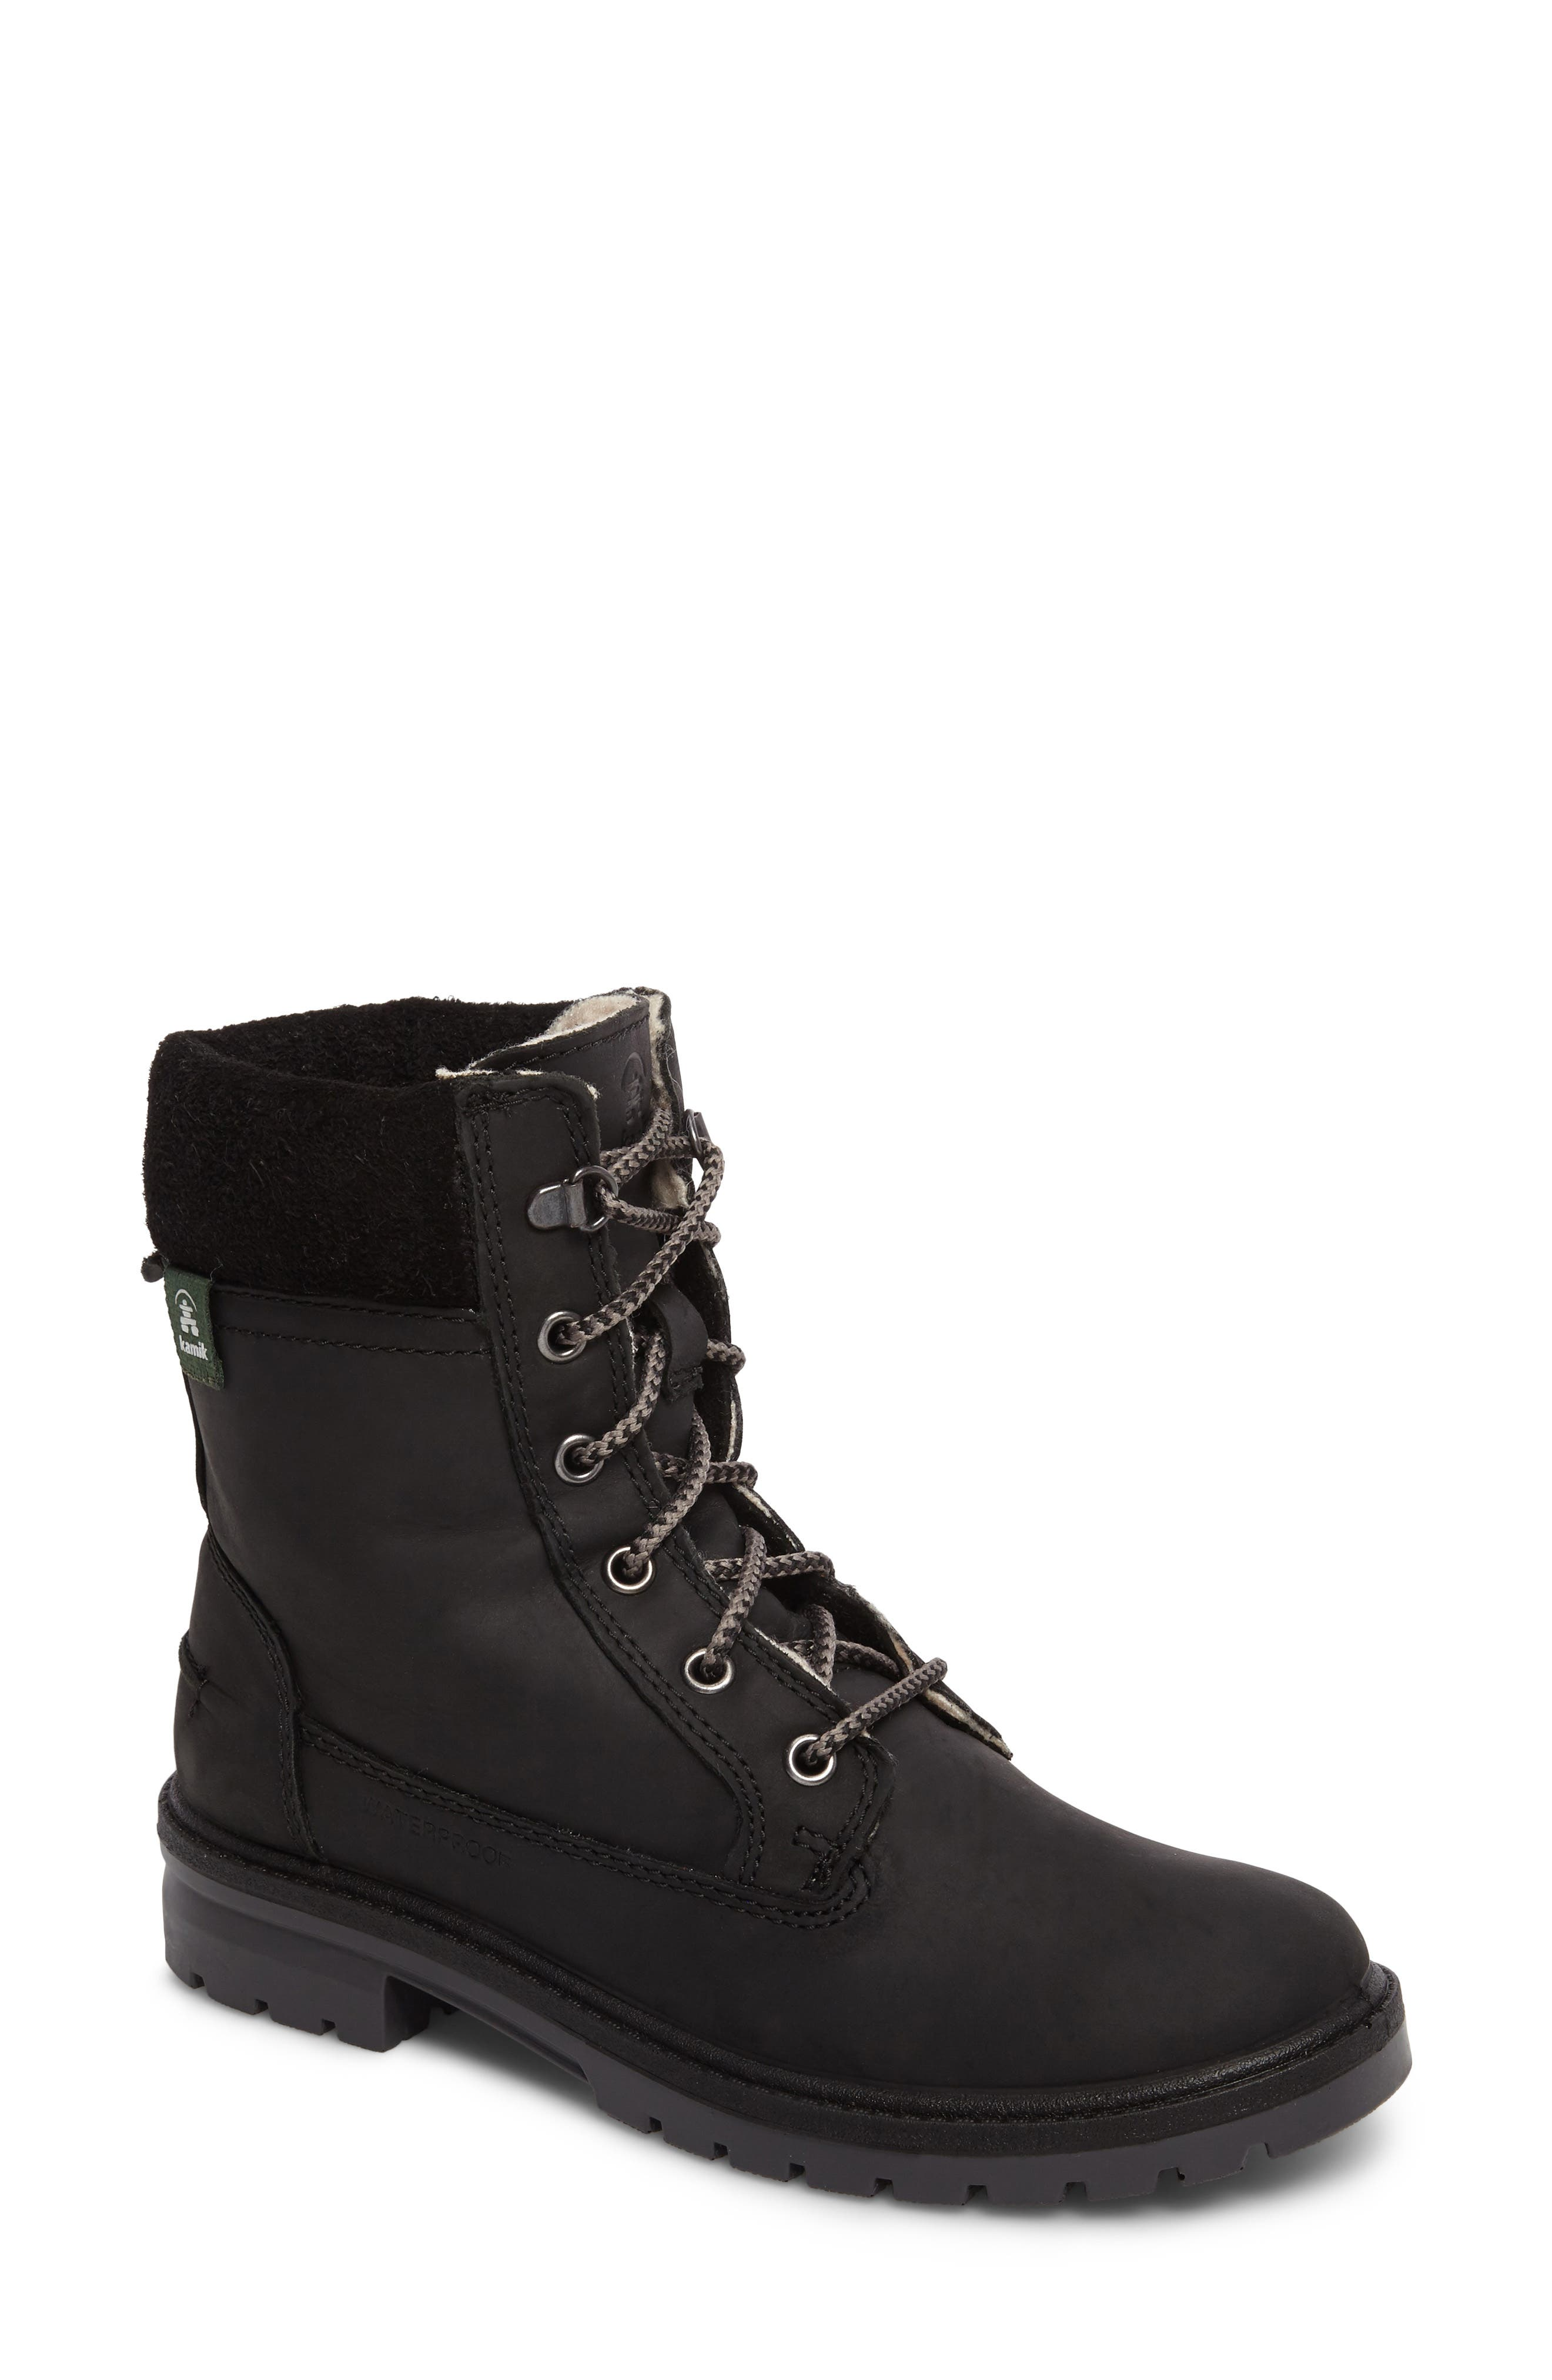 Rogue 5 Waterproof Boot, Main, color, 018